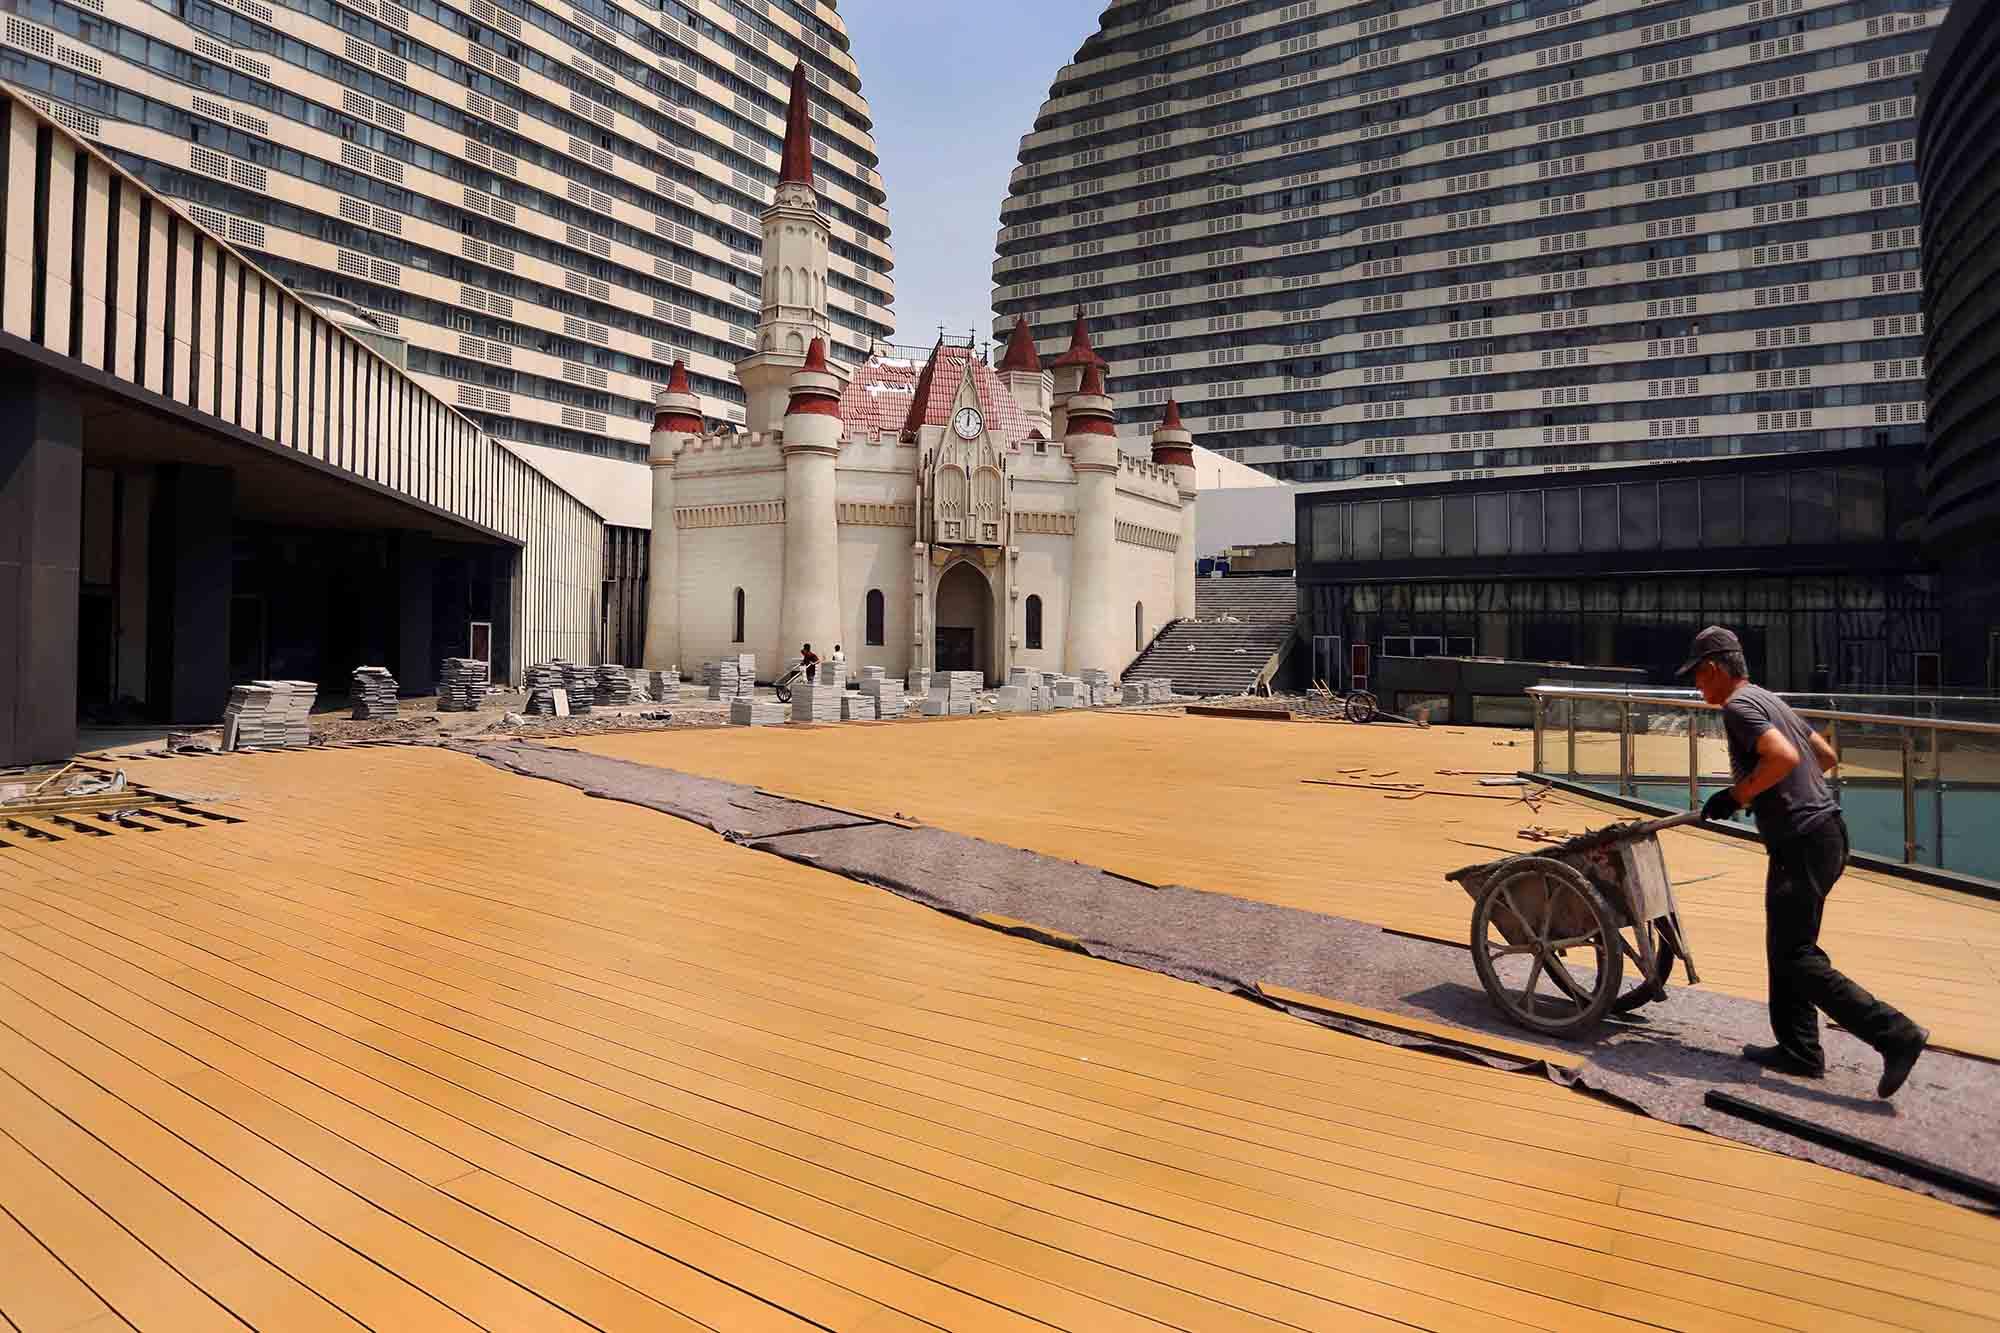 a workman wheels a barrow across a boardwalk area where a fairytale castle is being built between multi-storey buildings